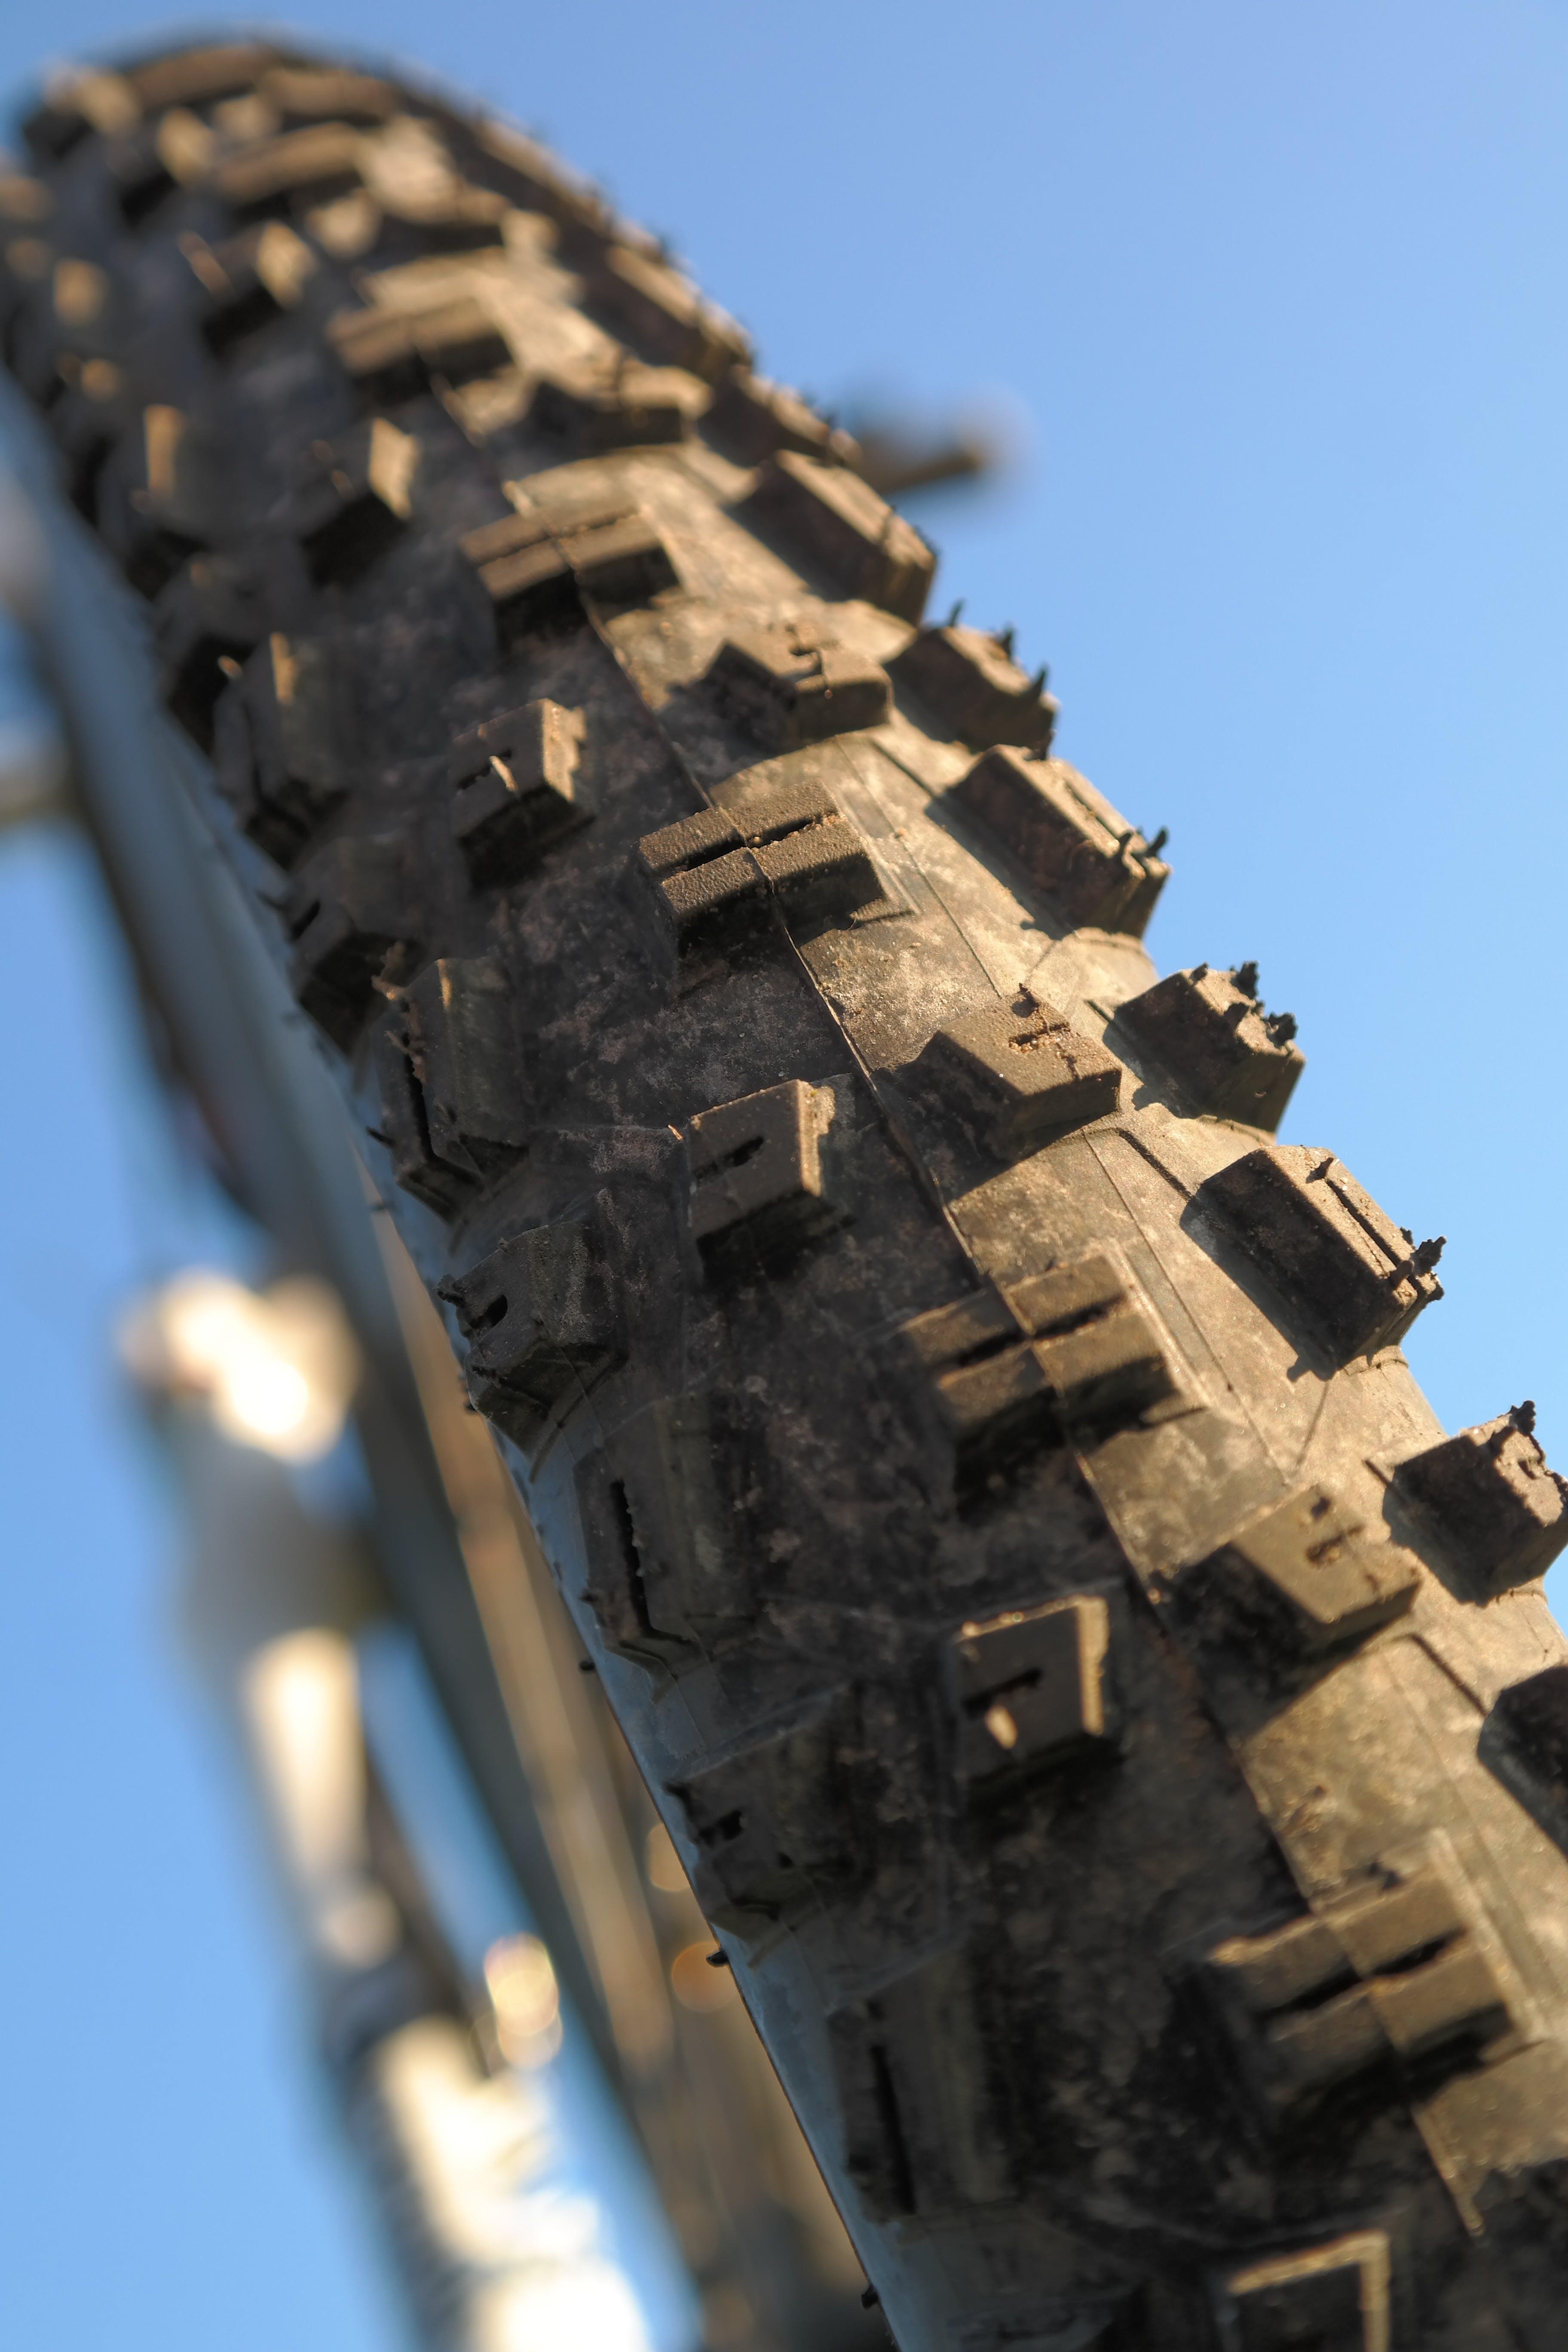 Macro Photography of Bicycle Tire